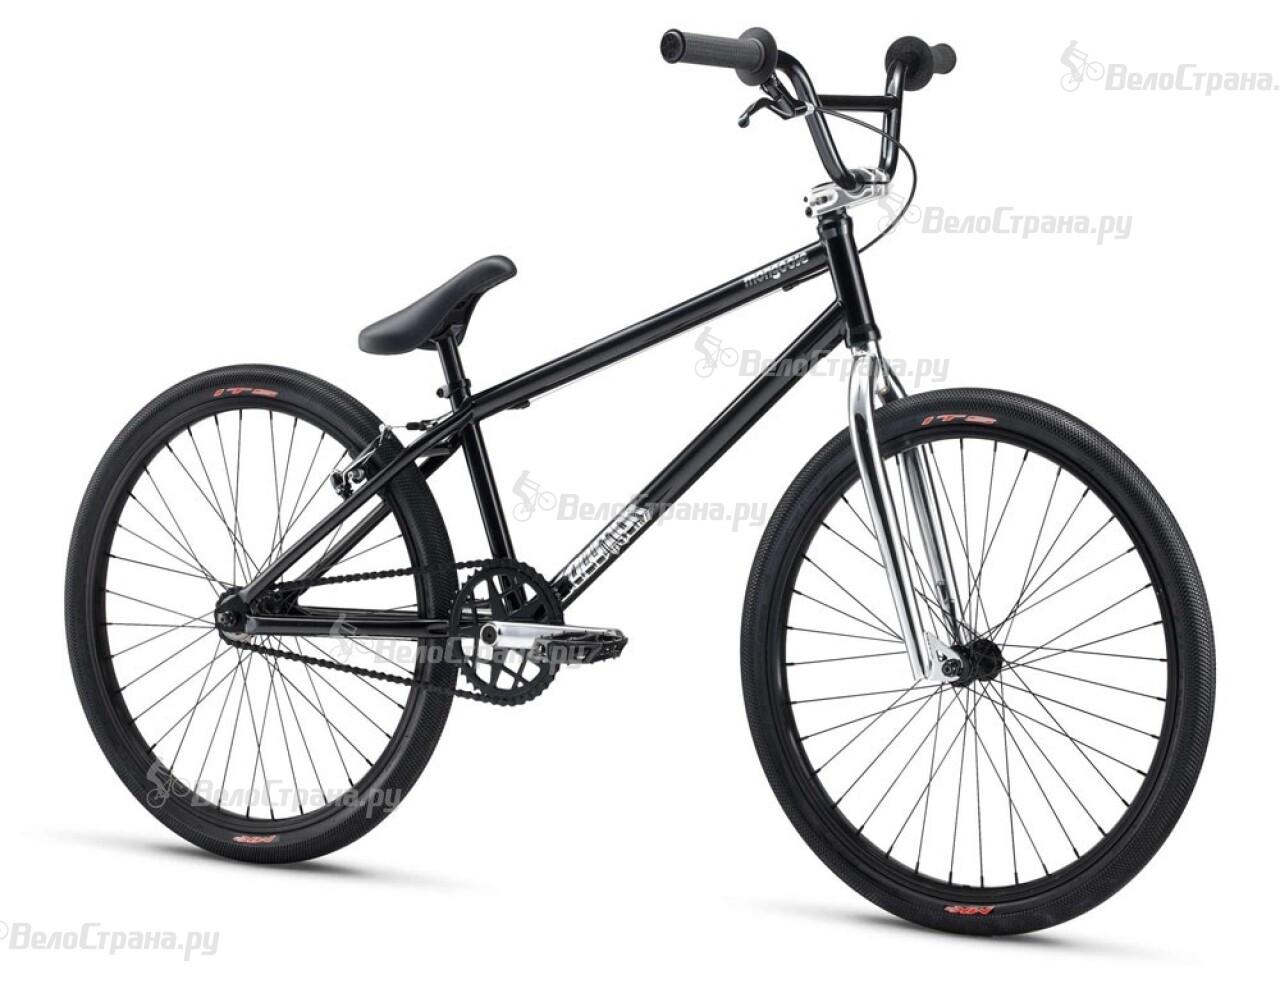 все цены на Велосипед Mongoose Ritual Dirt (2013) онлайн